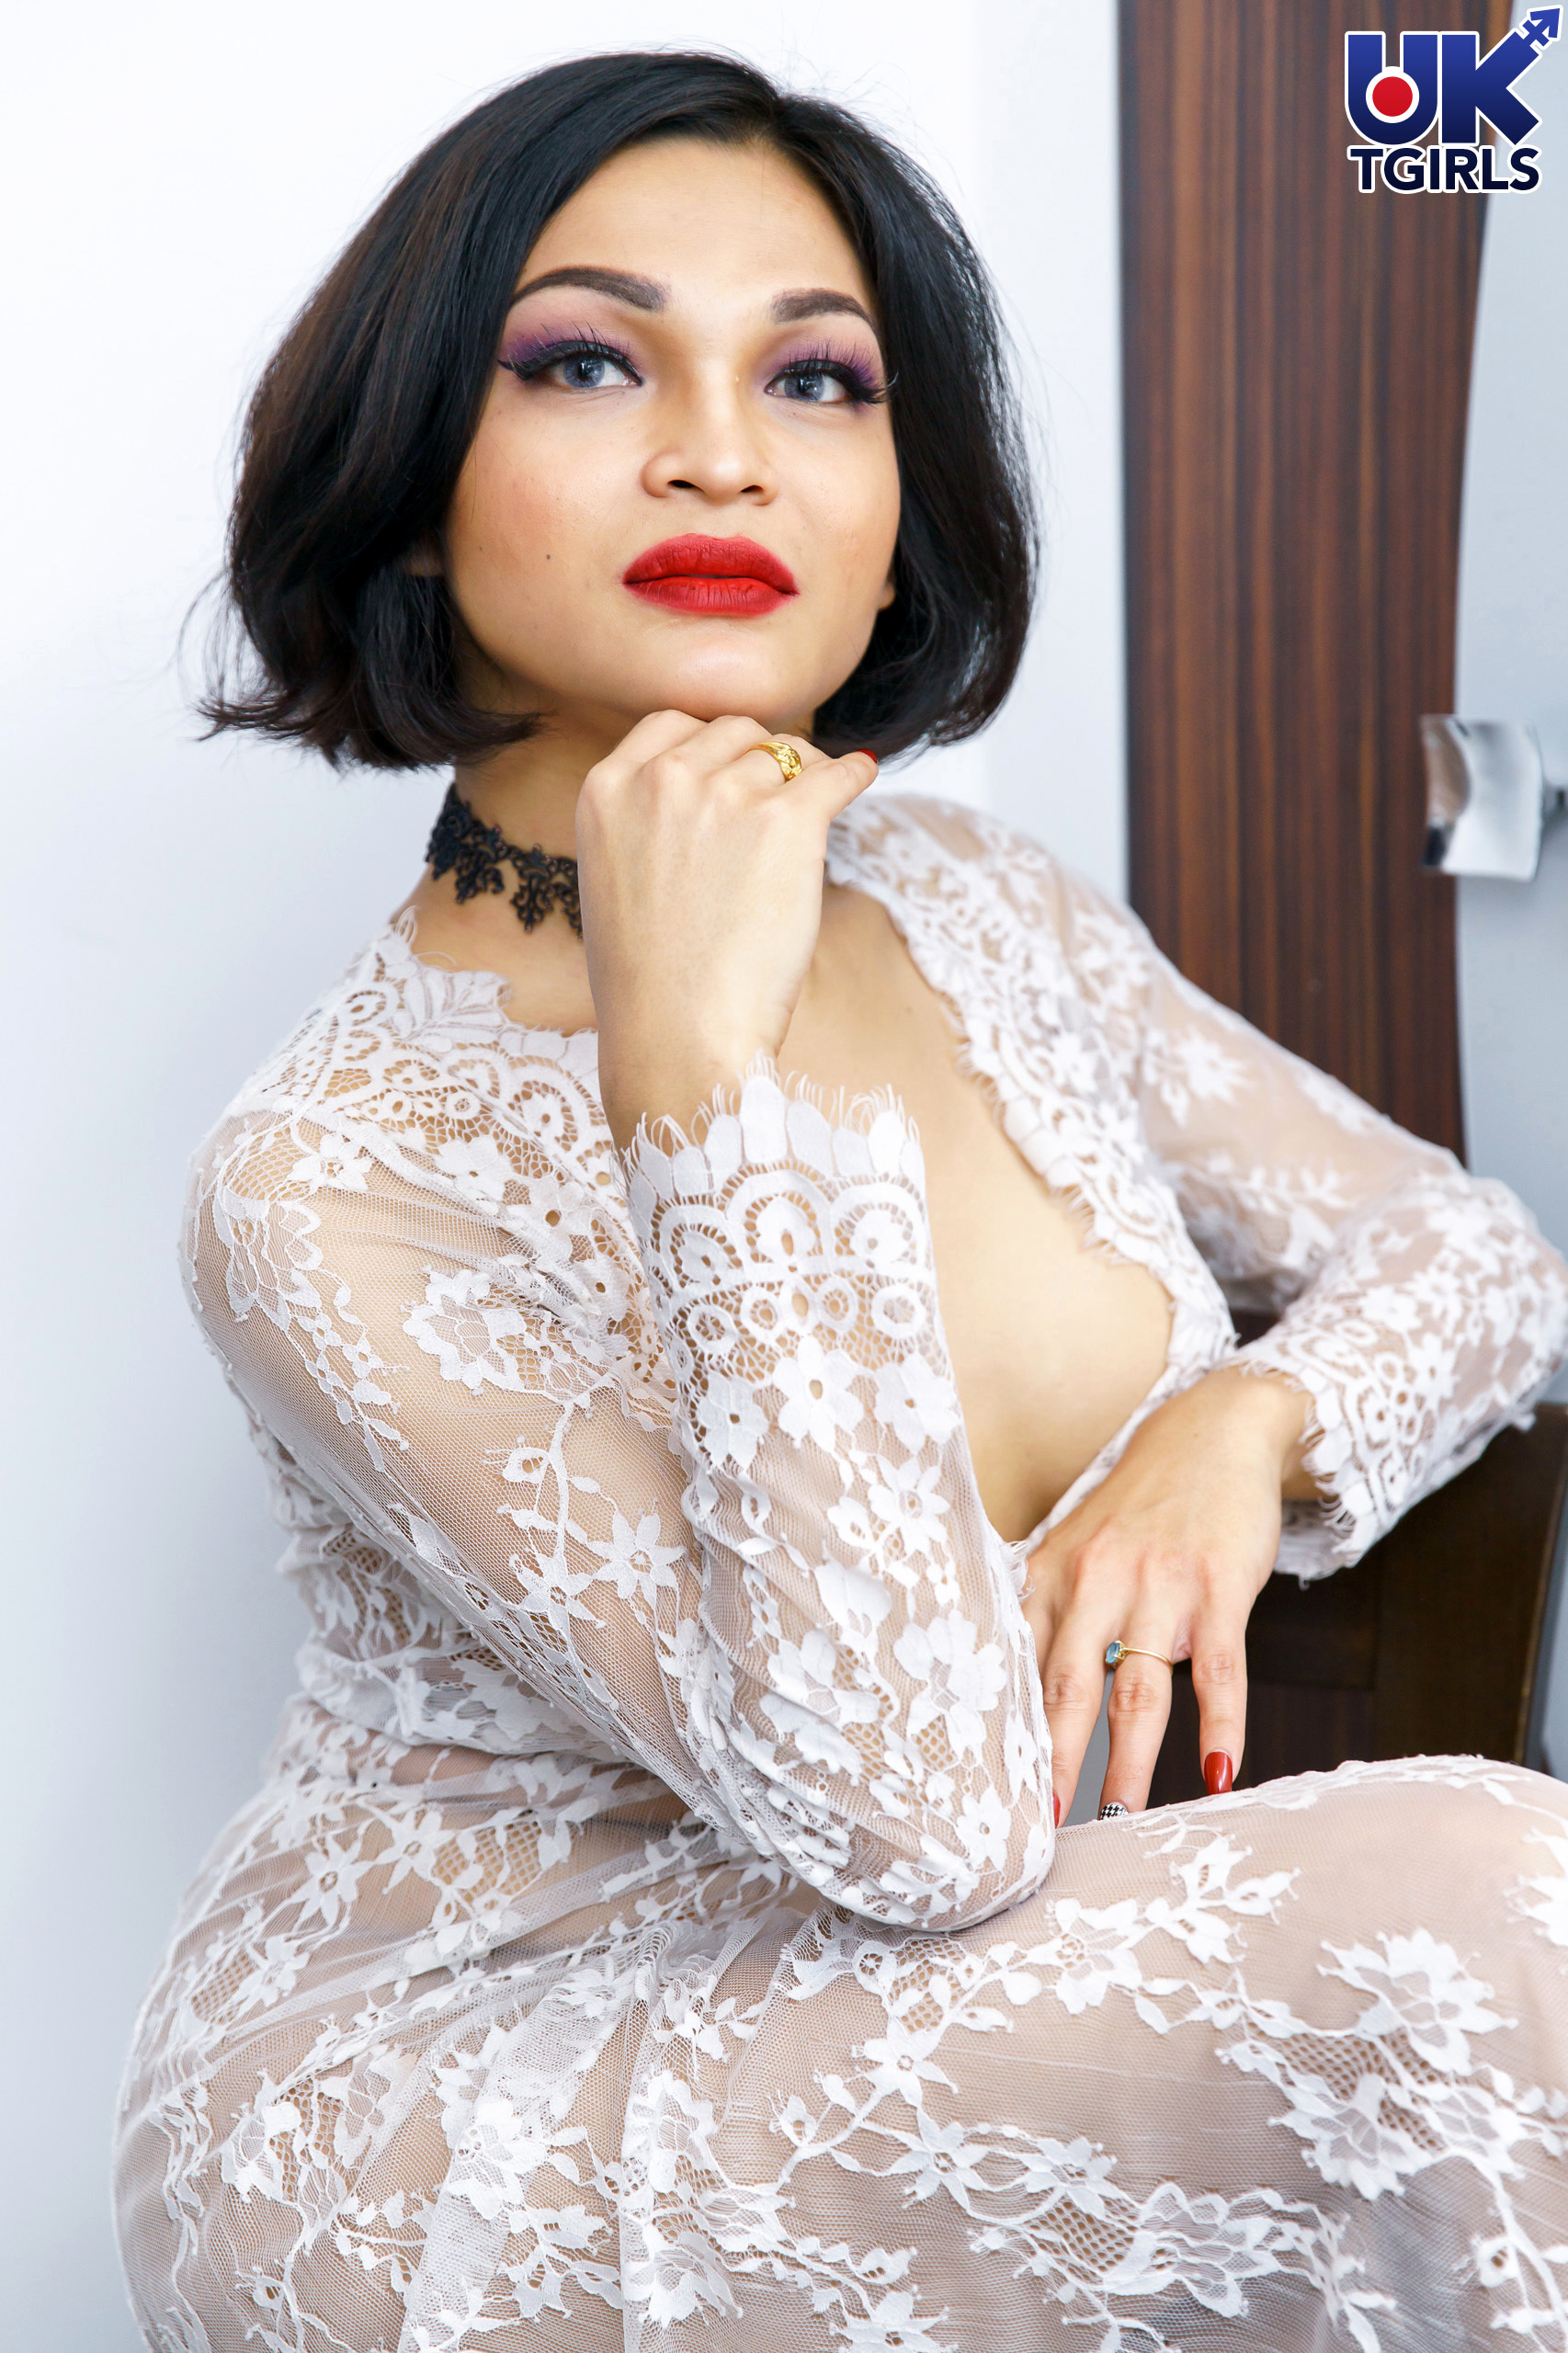 Nadtasha Looks Marvelous In Her